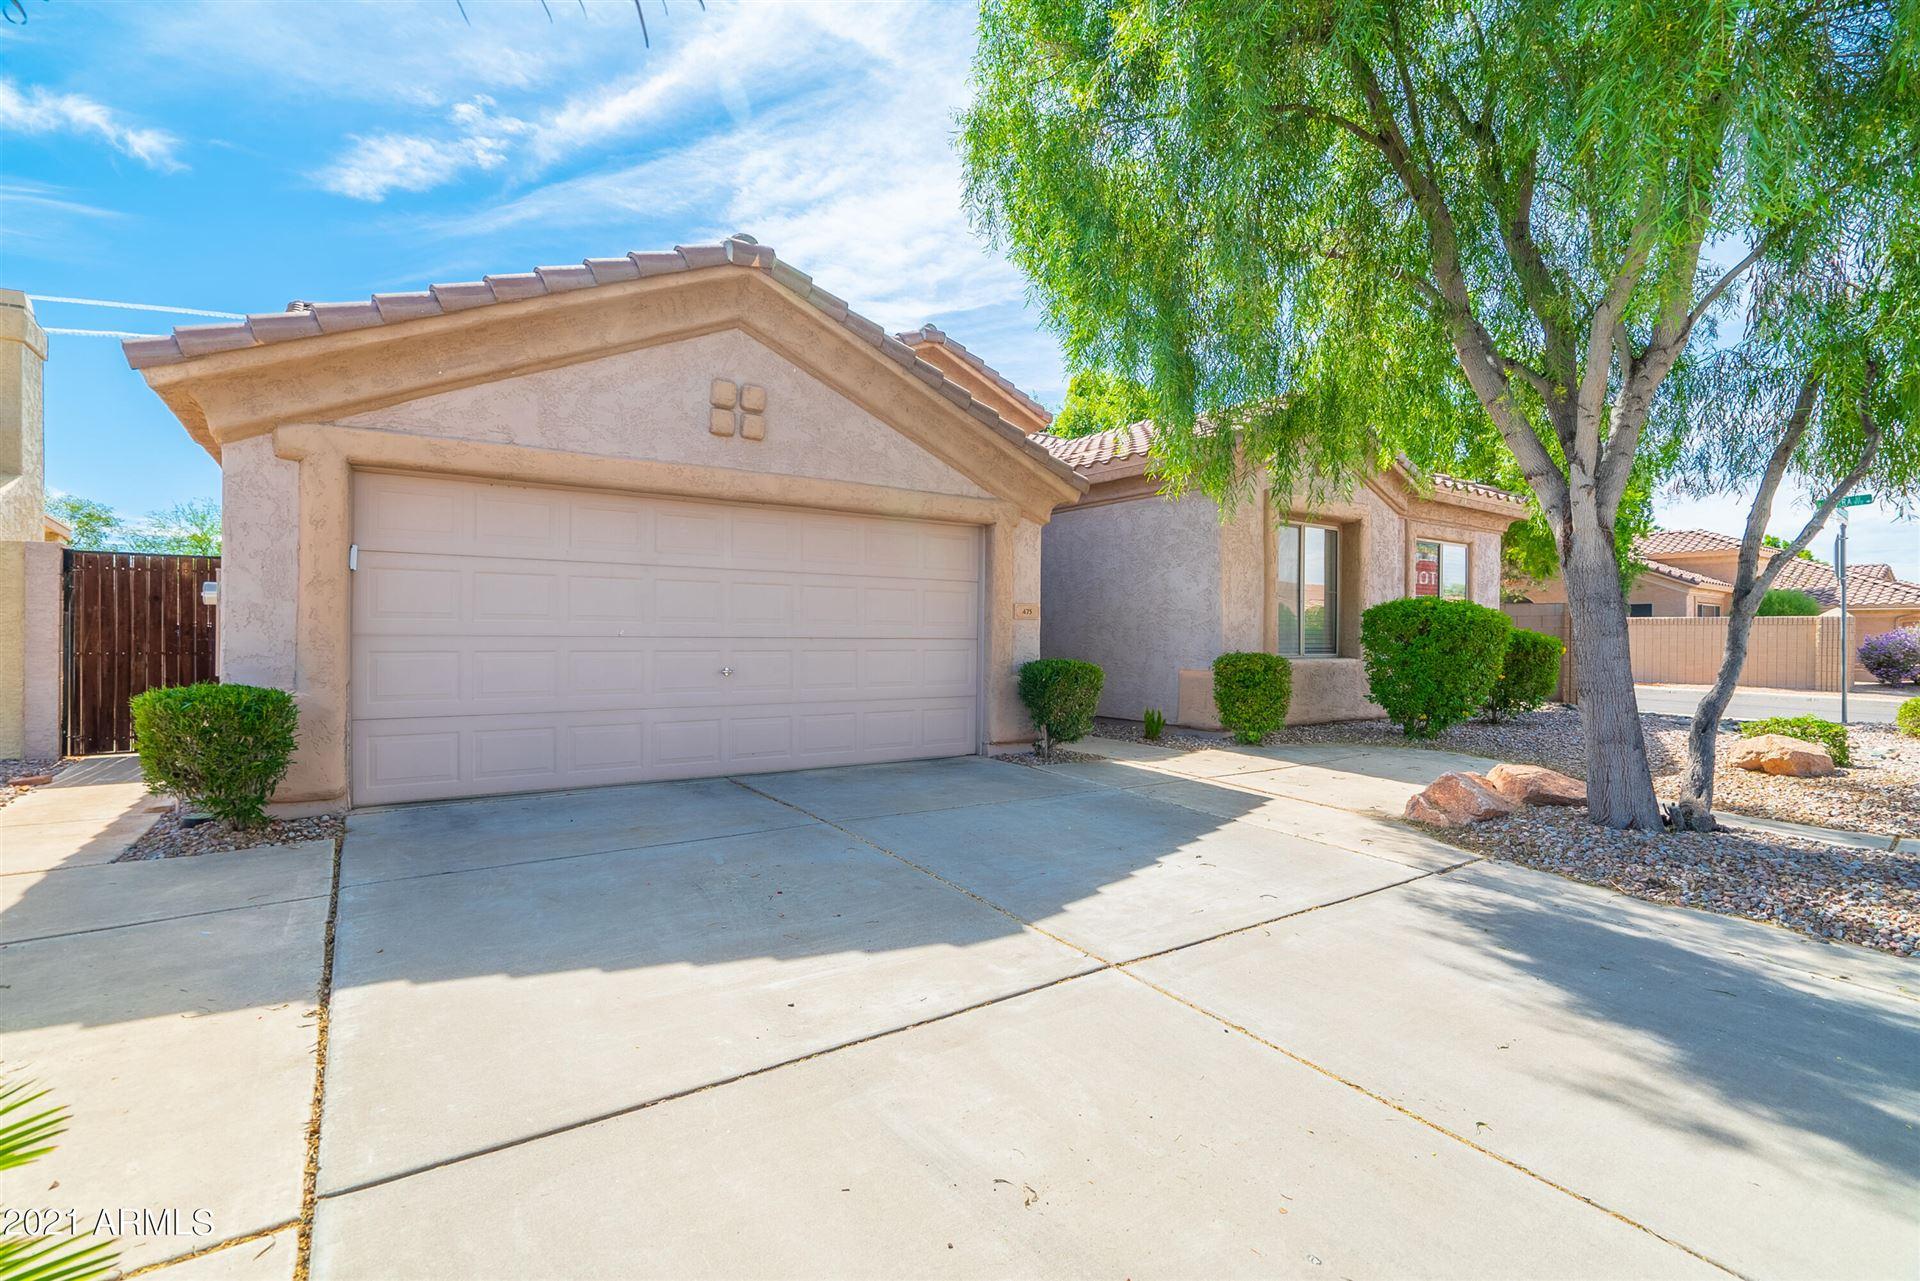 Photo of 475 E STOTTLER Drive, Gilbert, AZ 85296 (MLS # 6306958)